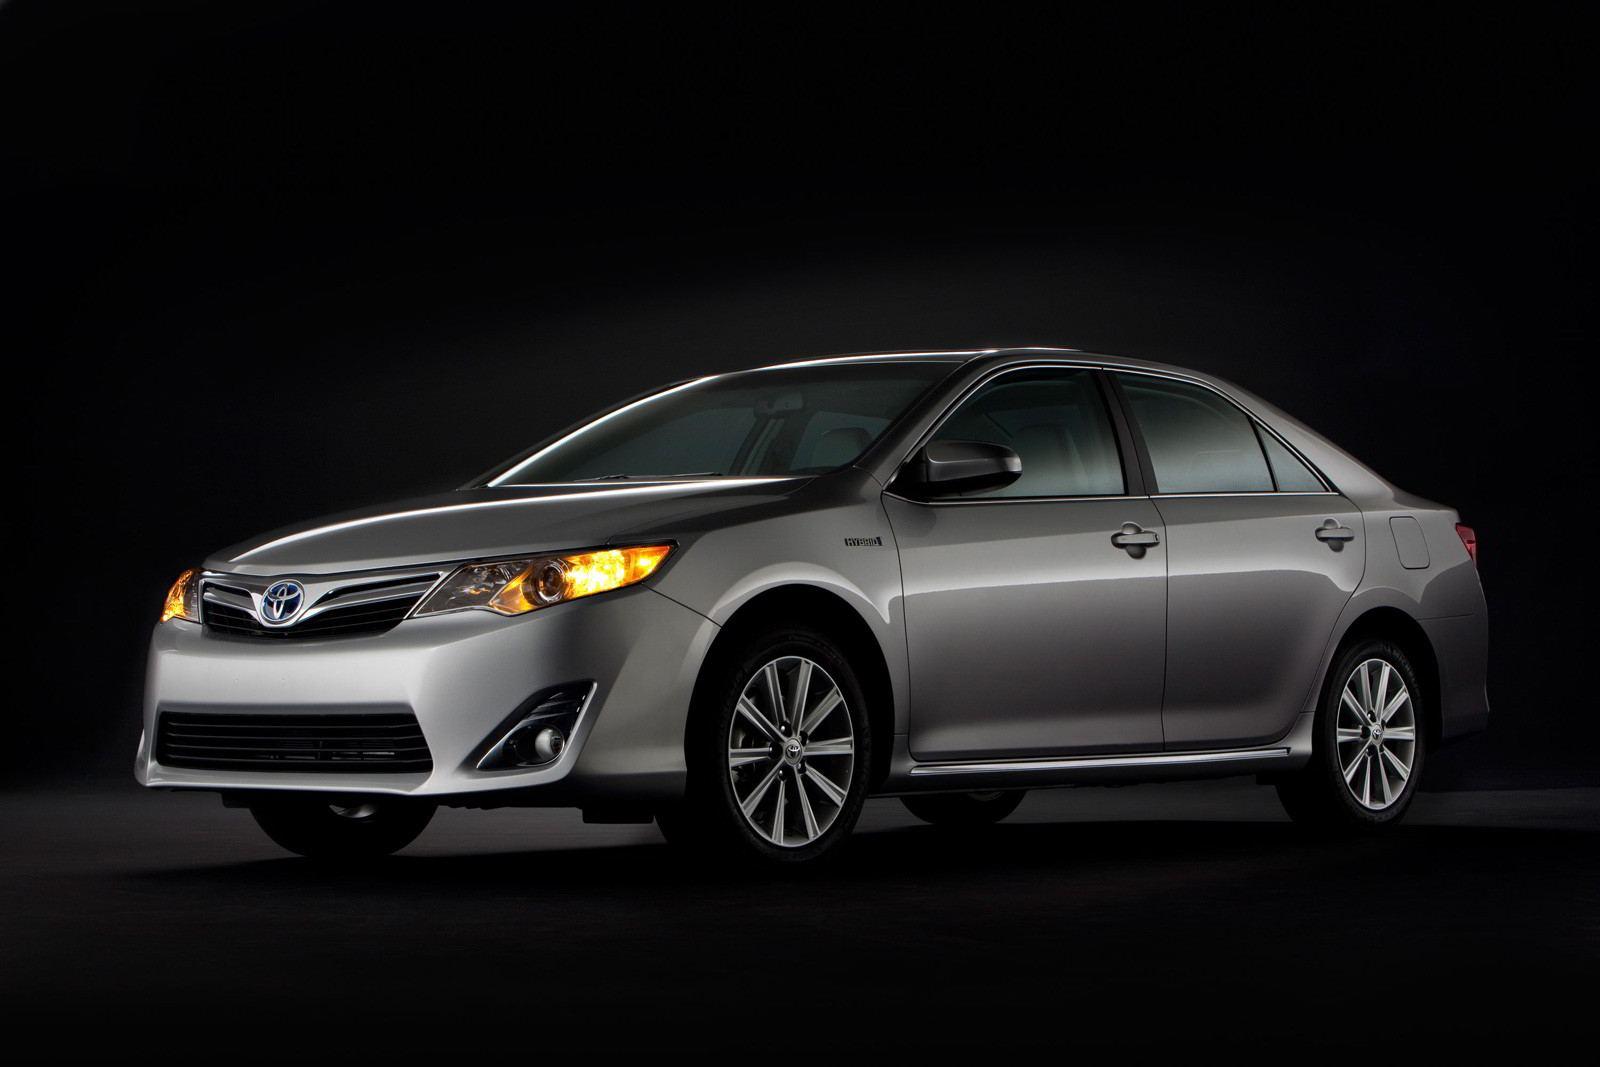 2012_Toyota_Camry_Hybrid_18.jpg